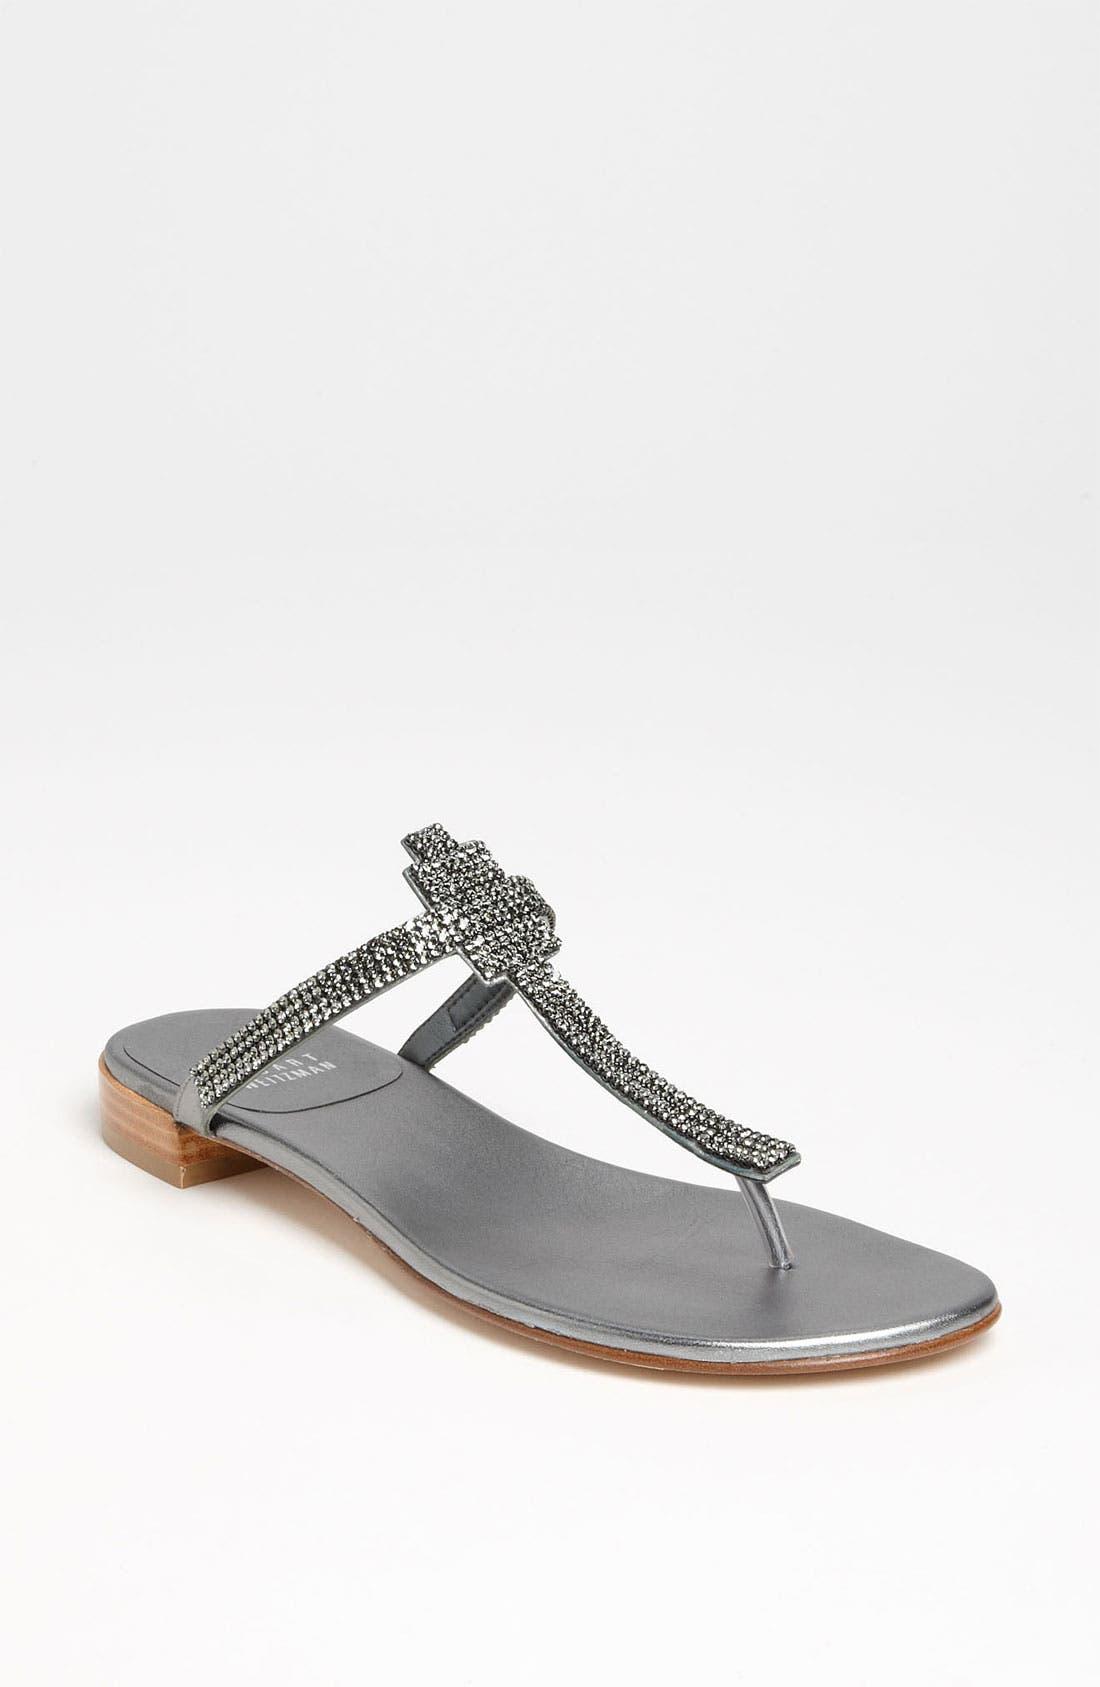 Main Image - Stuart Weitzman 'Vanity' Sandal